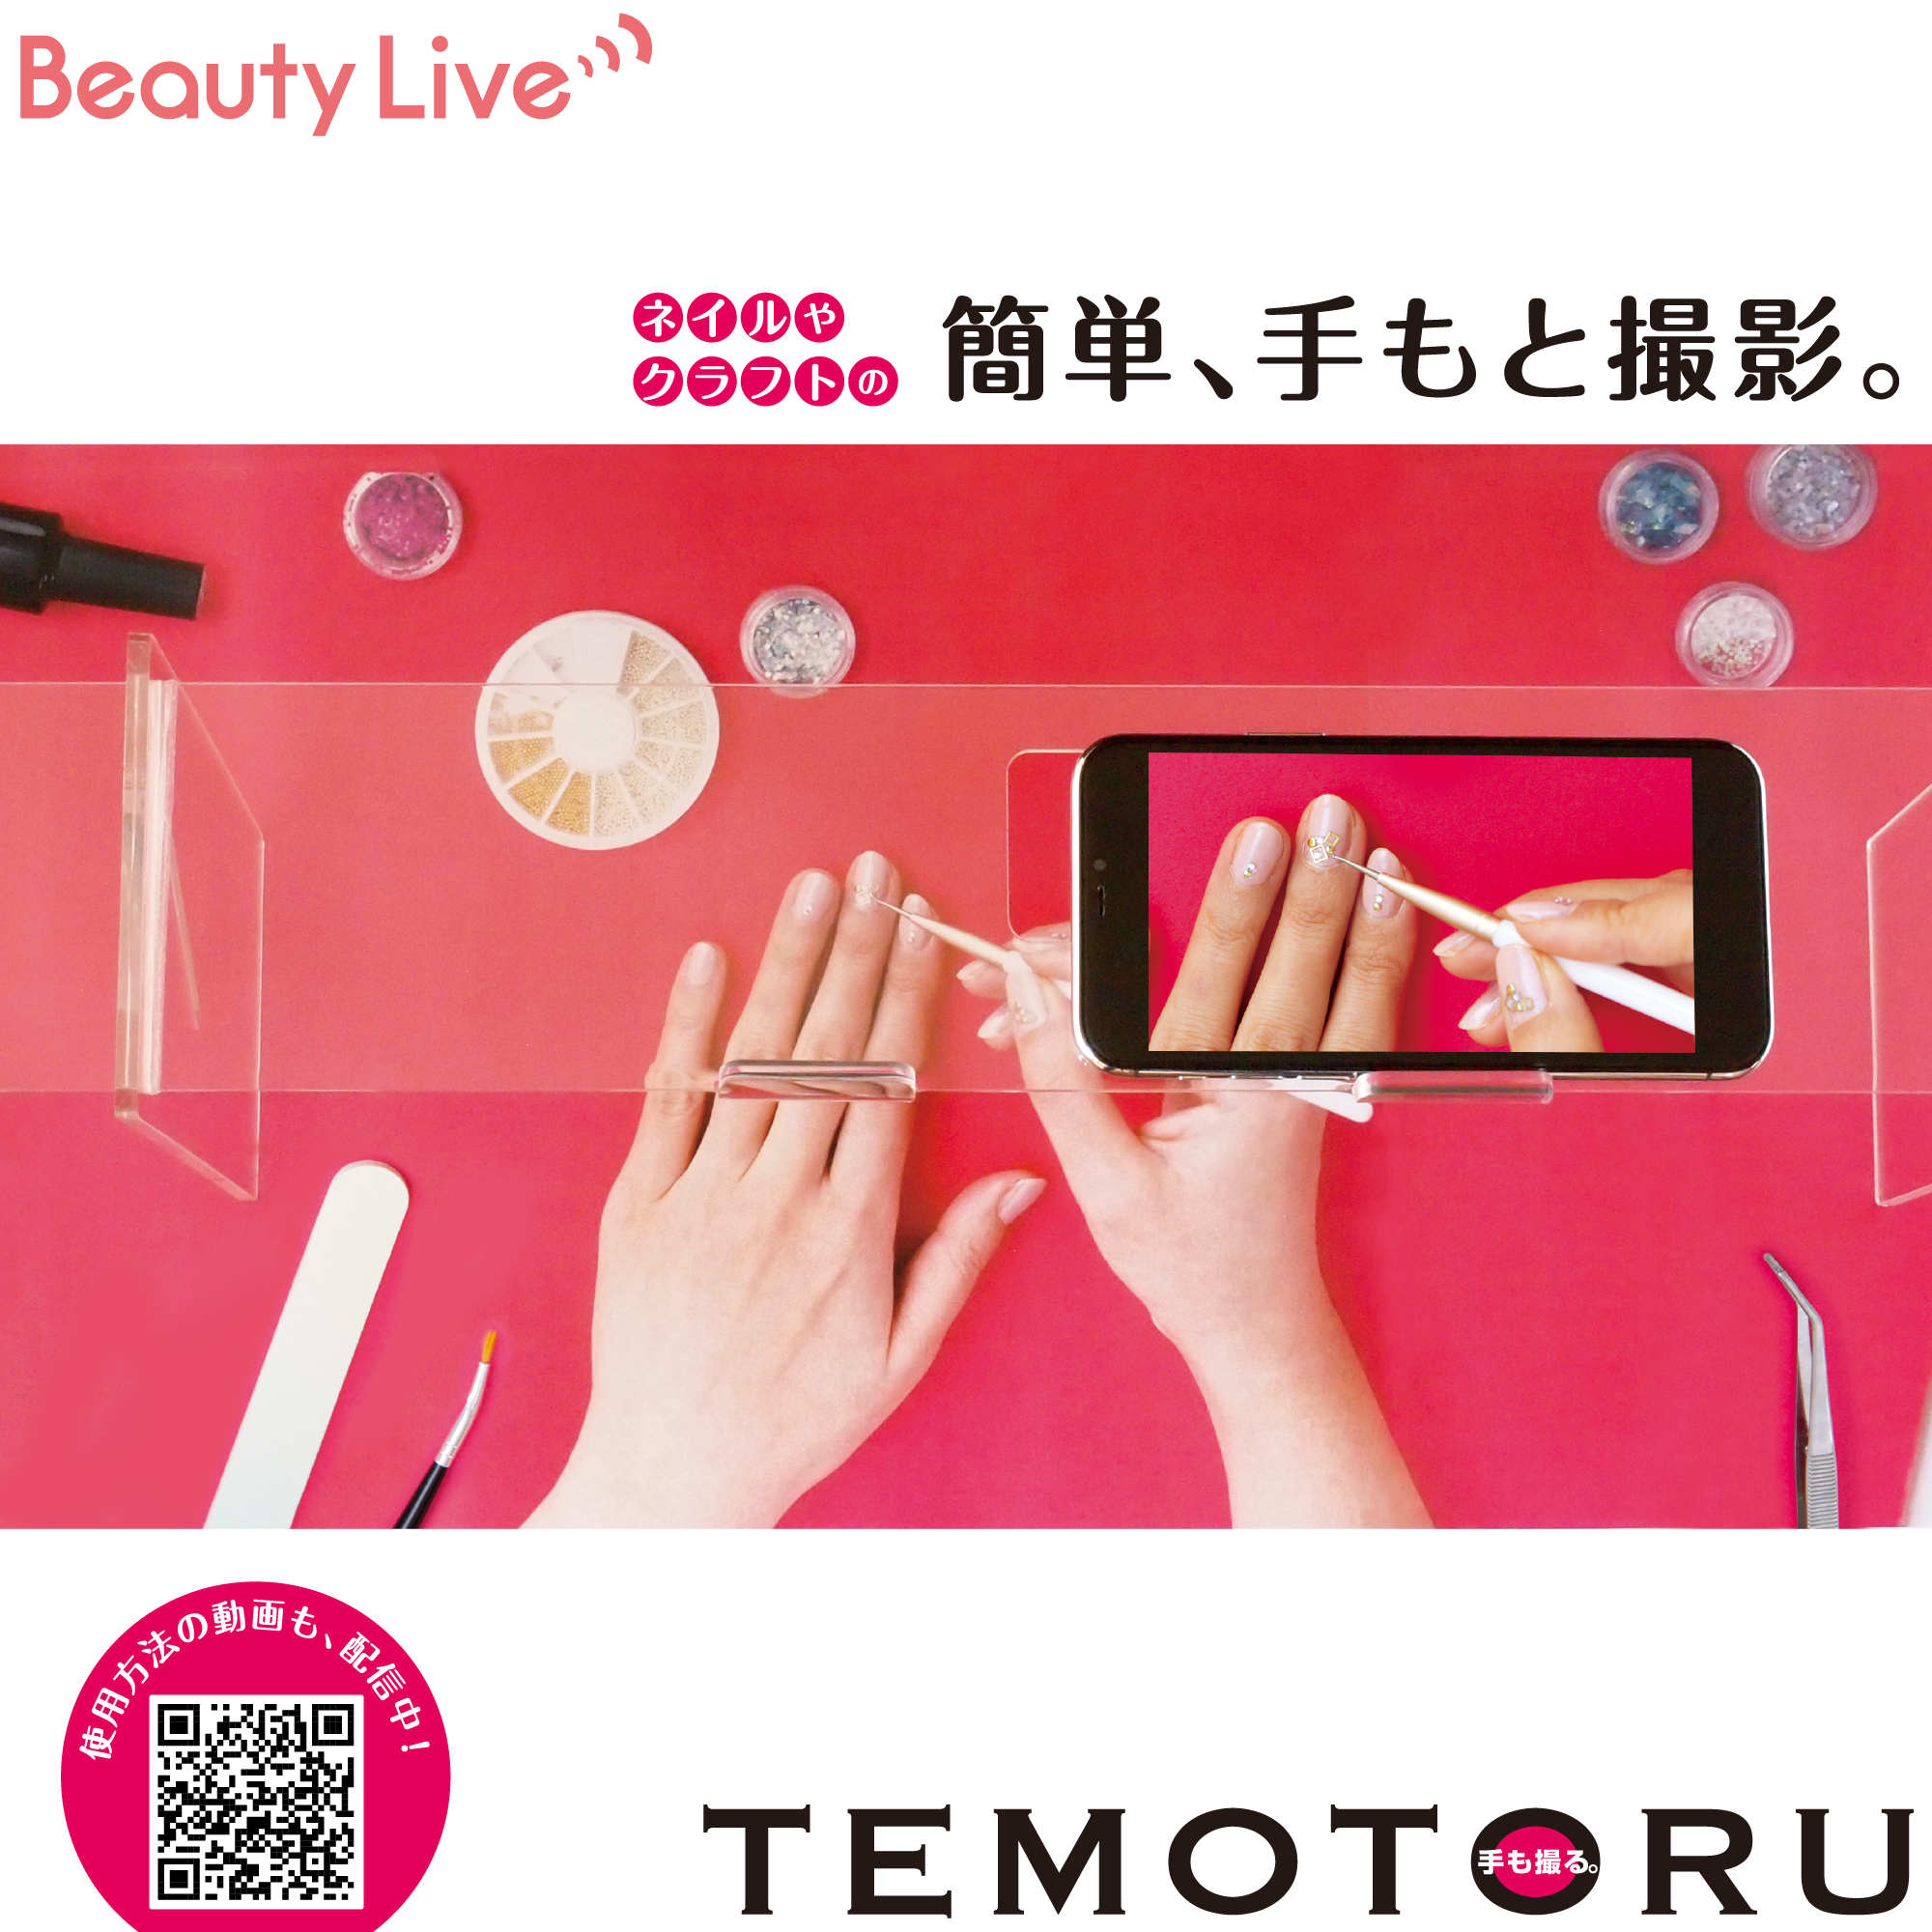 BeautyLive TEMOTORU(TT-1)画像